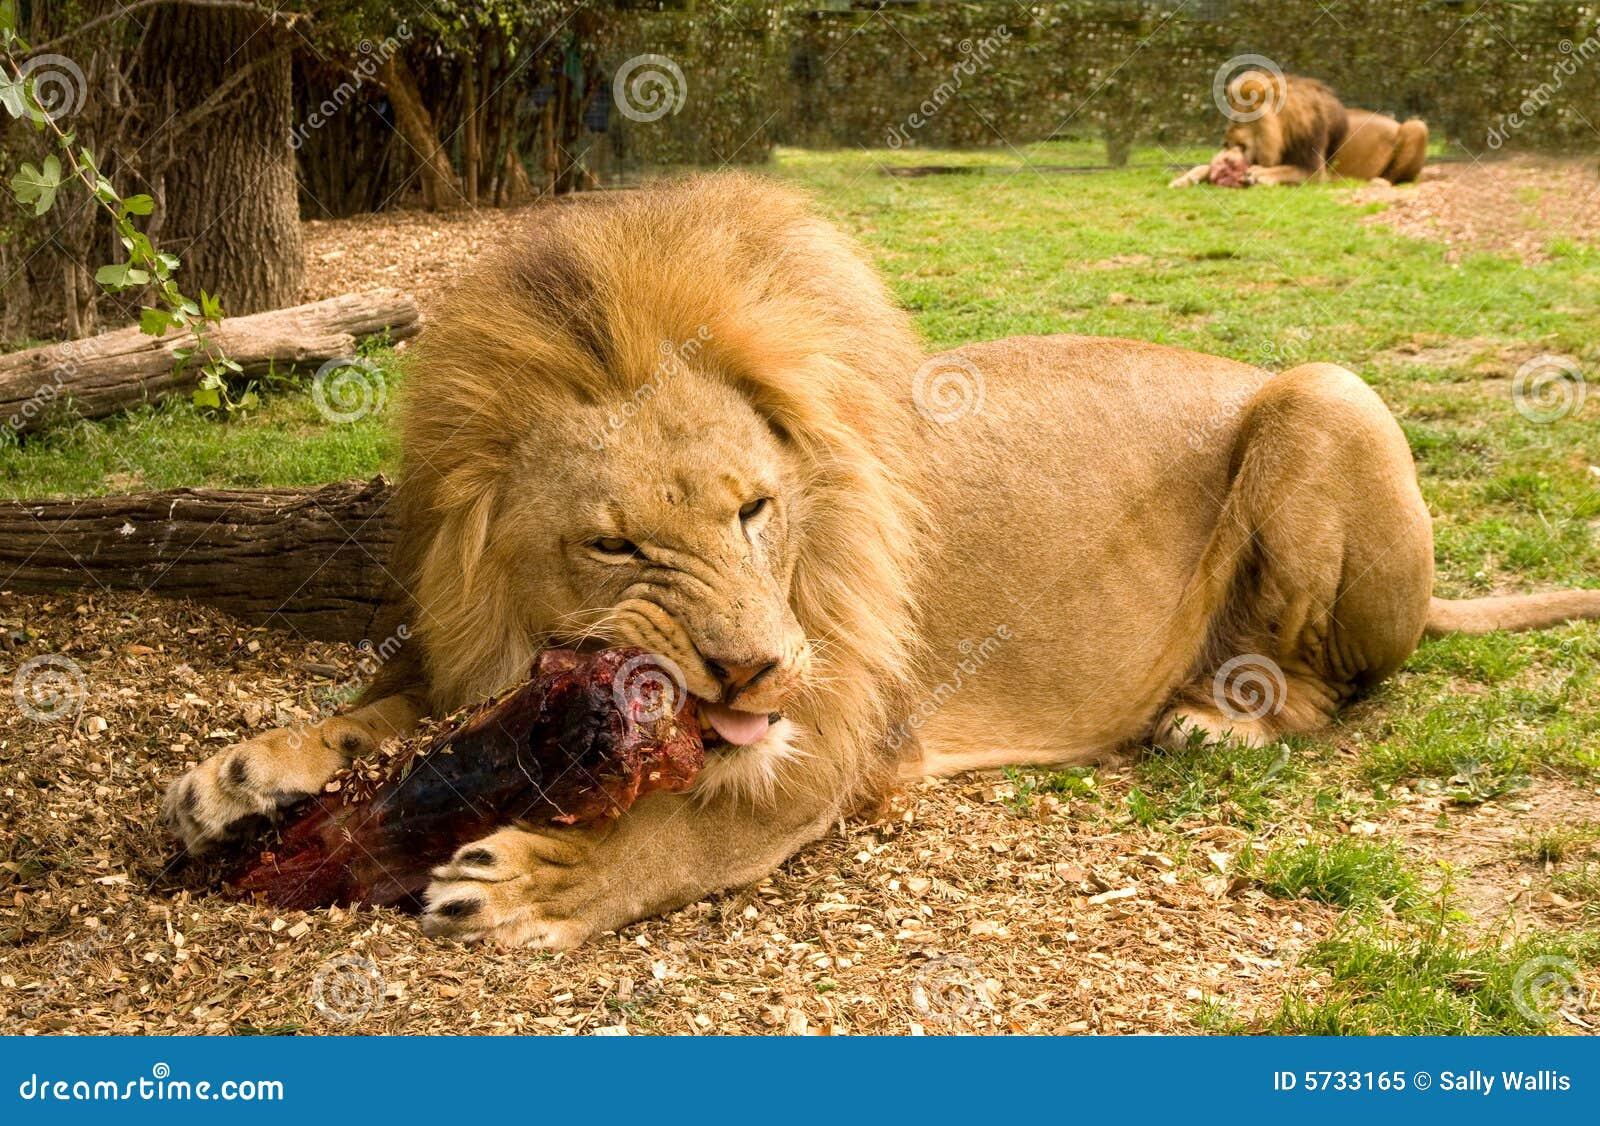 Lion meat taste - photo#21